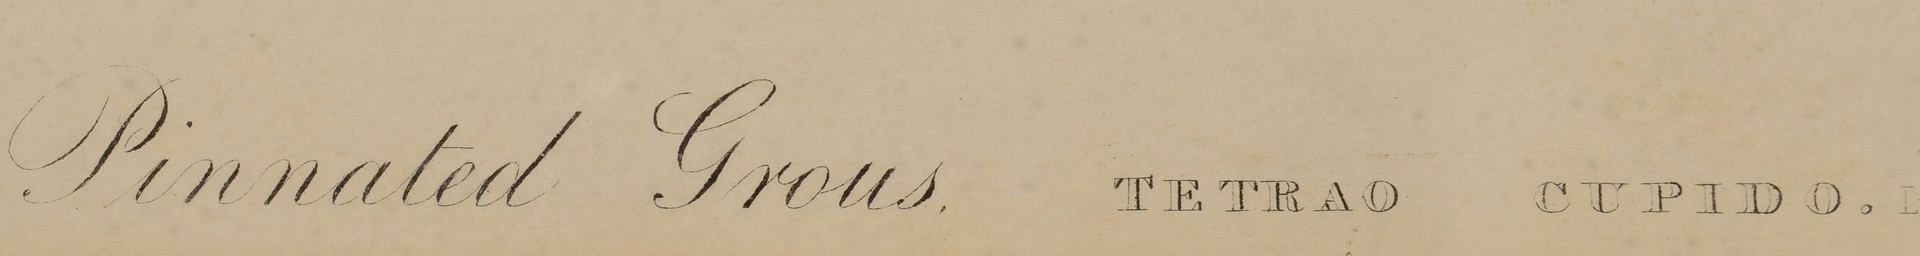 Lot 244: John J. Audubon, Bien Edition, Pinnated Grouse